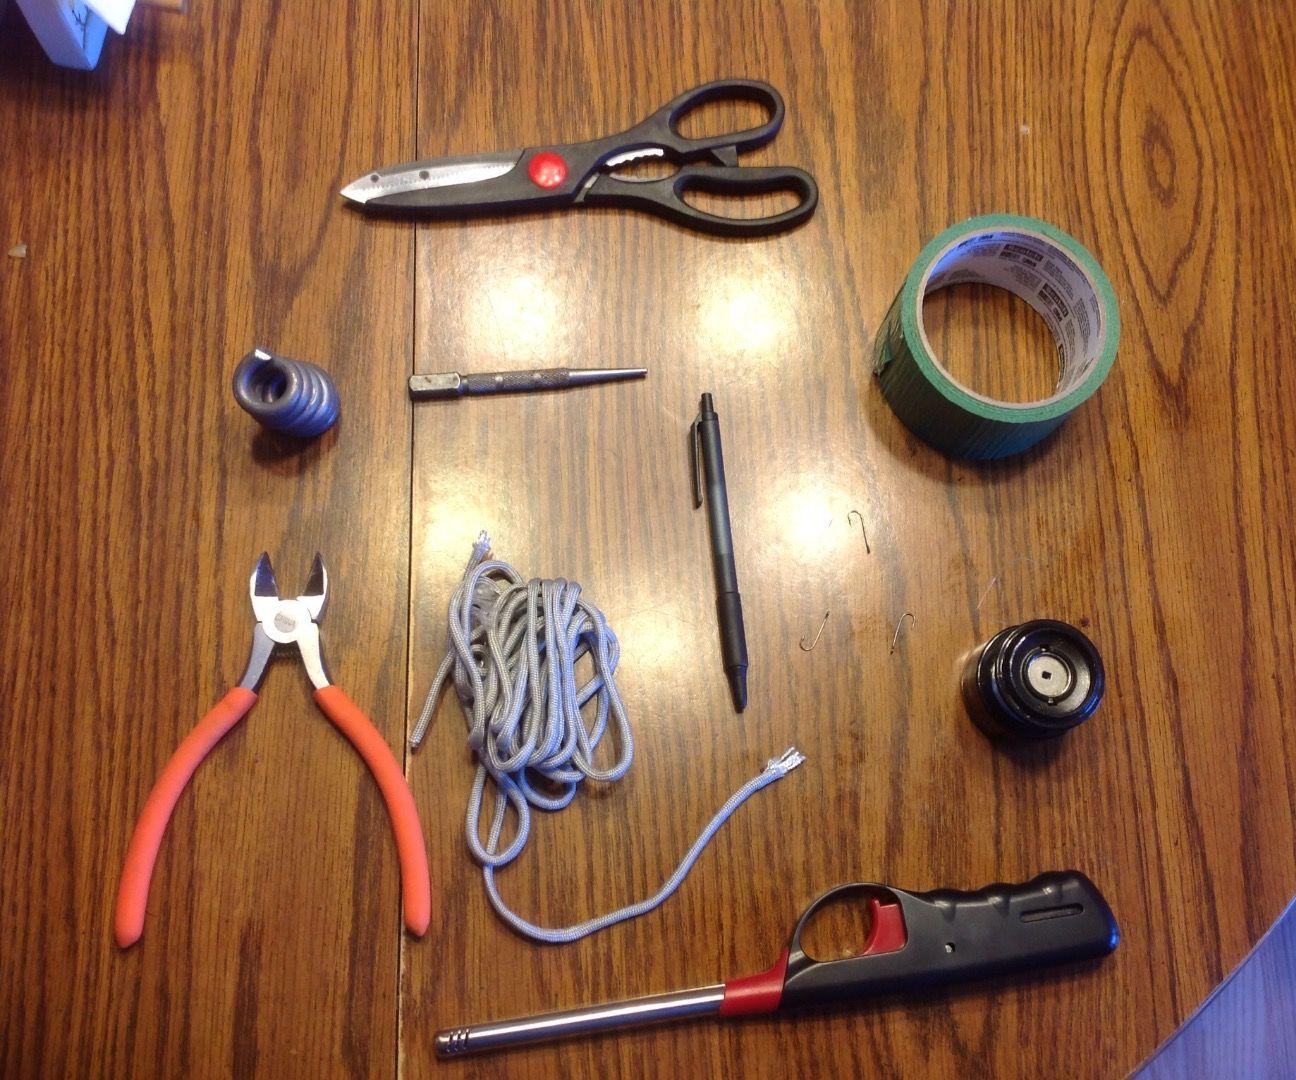 Duct tape survival/paracord